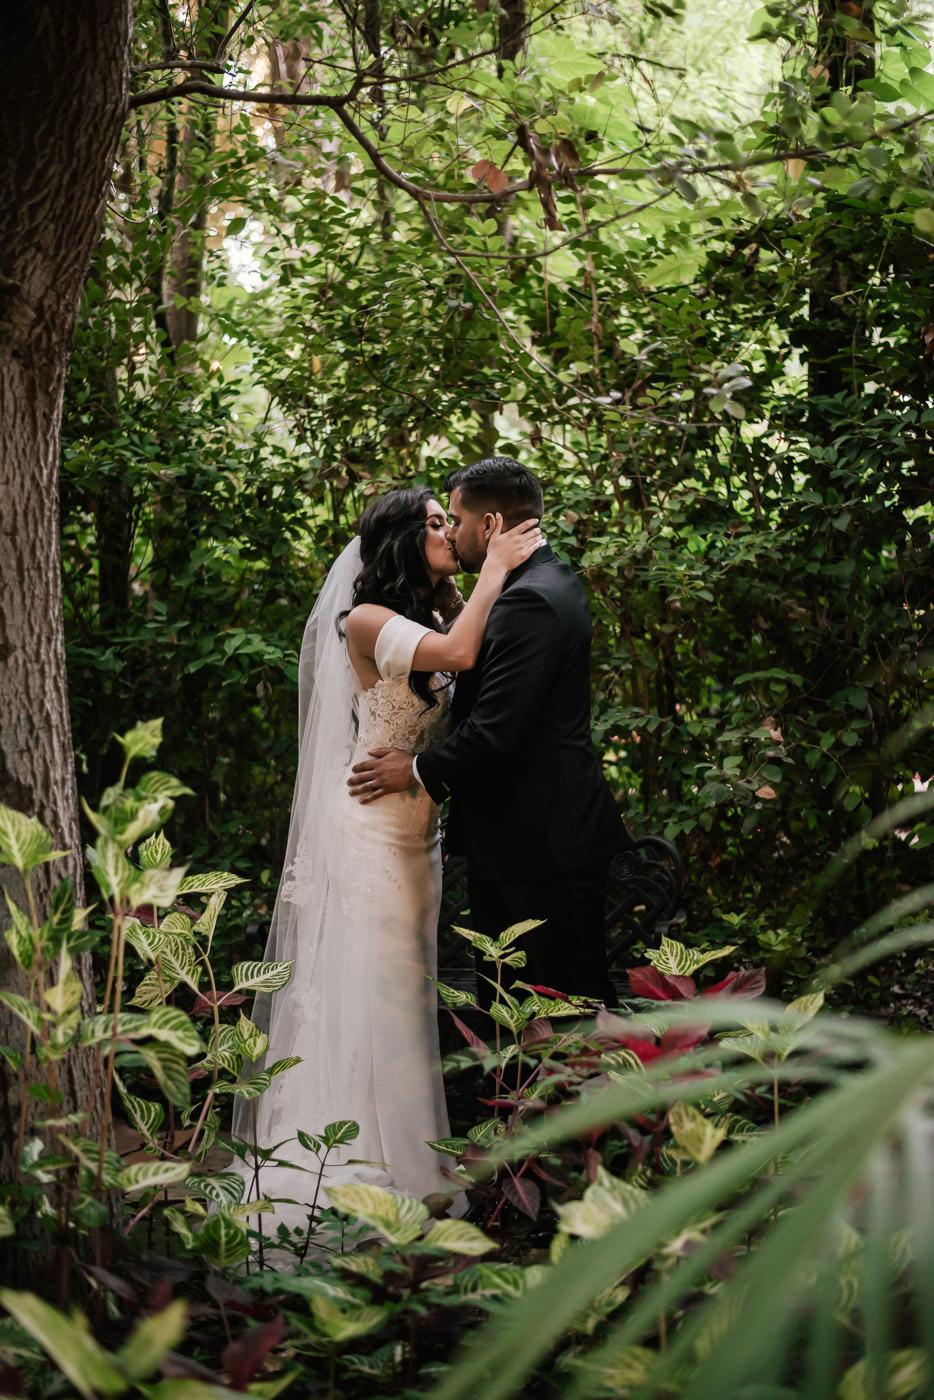 eden-gardens-wedding-photographer-romantic-78.jpg